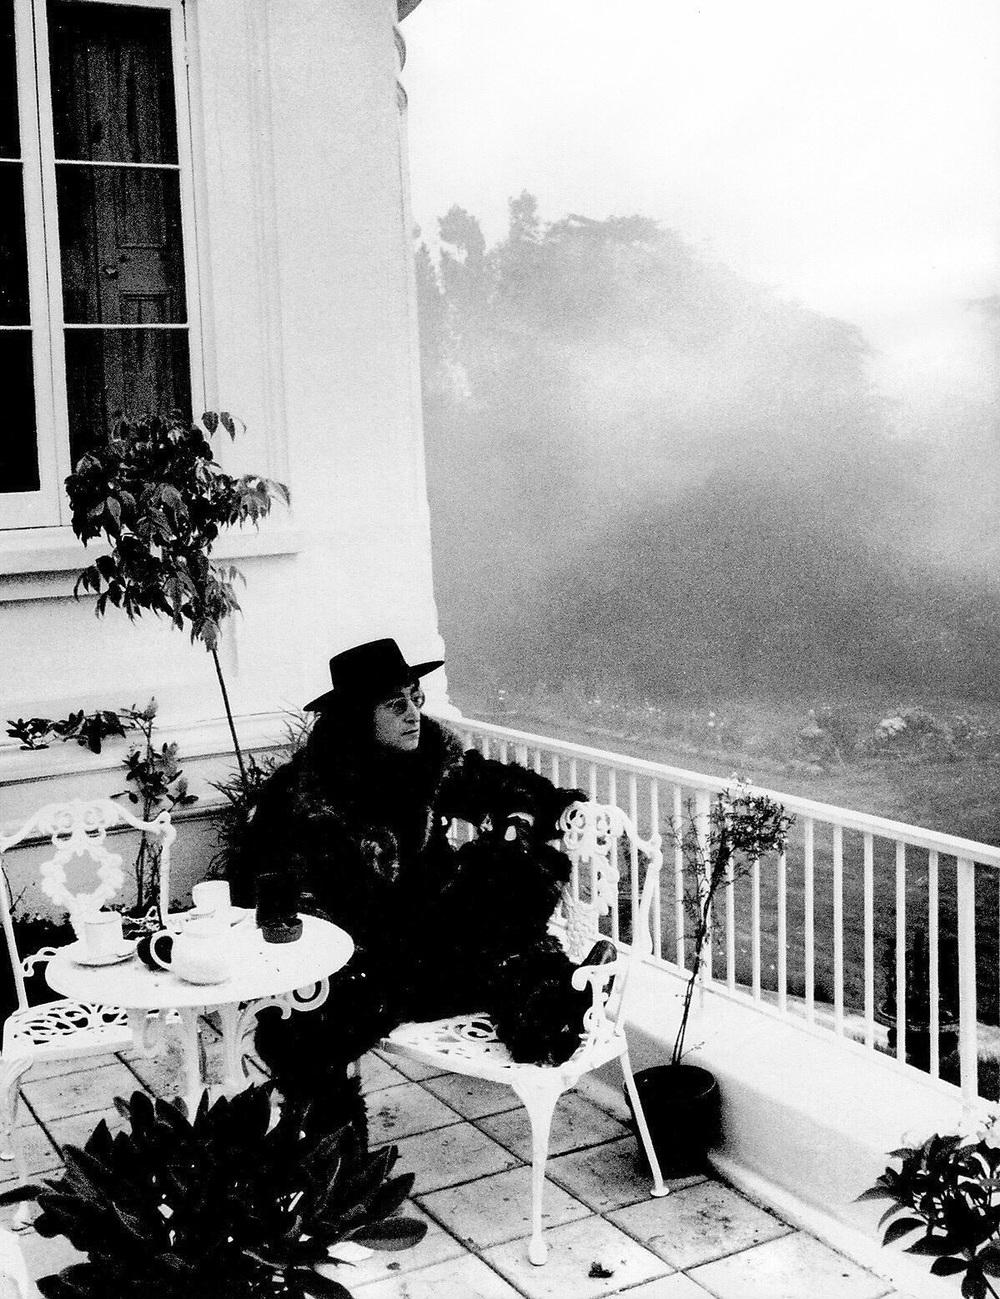 John Lennon at Tittenhurst Park, circa 1971.